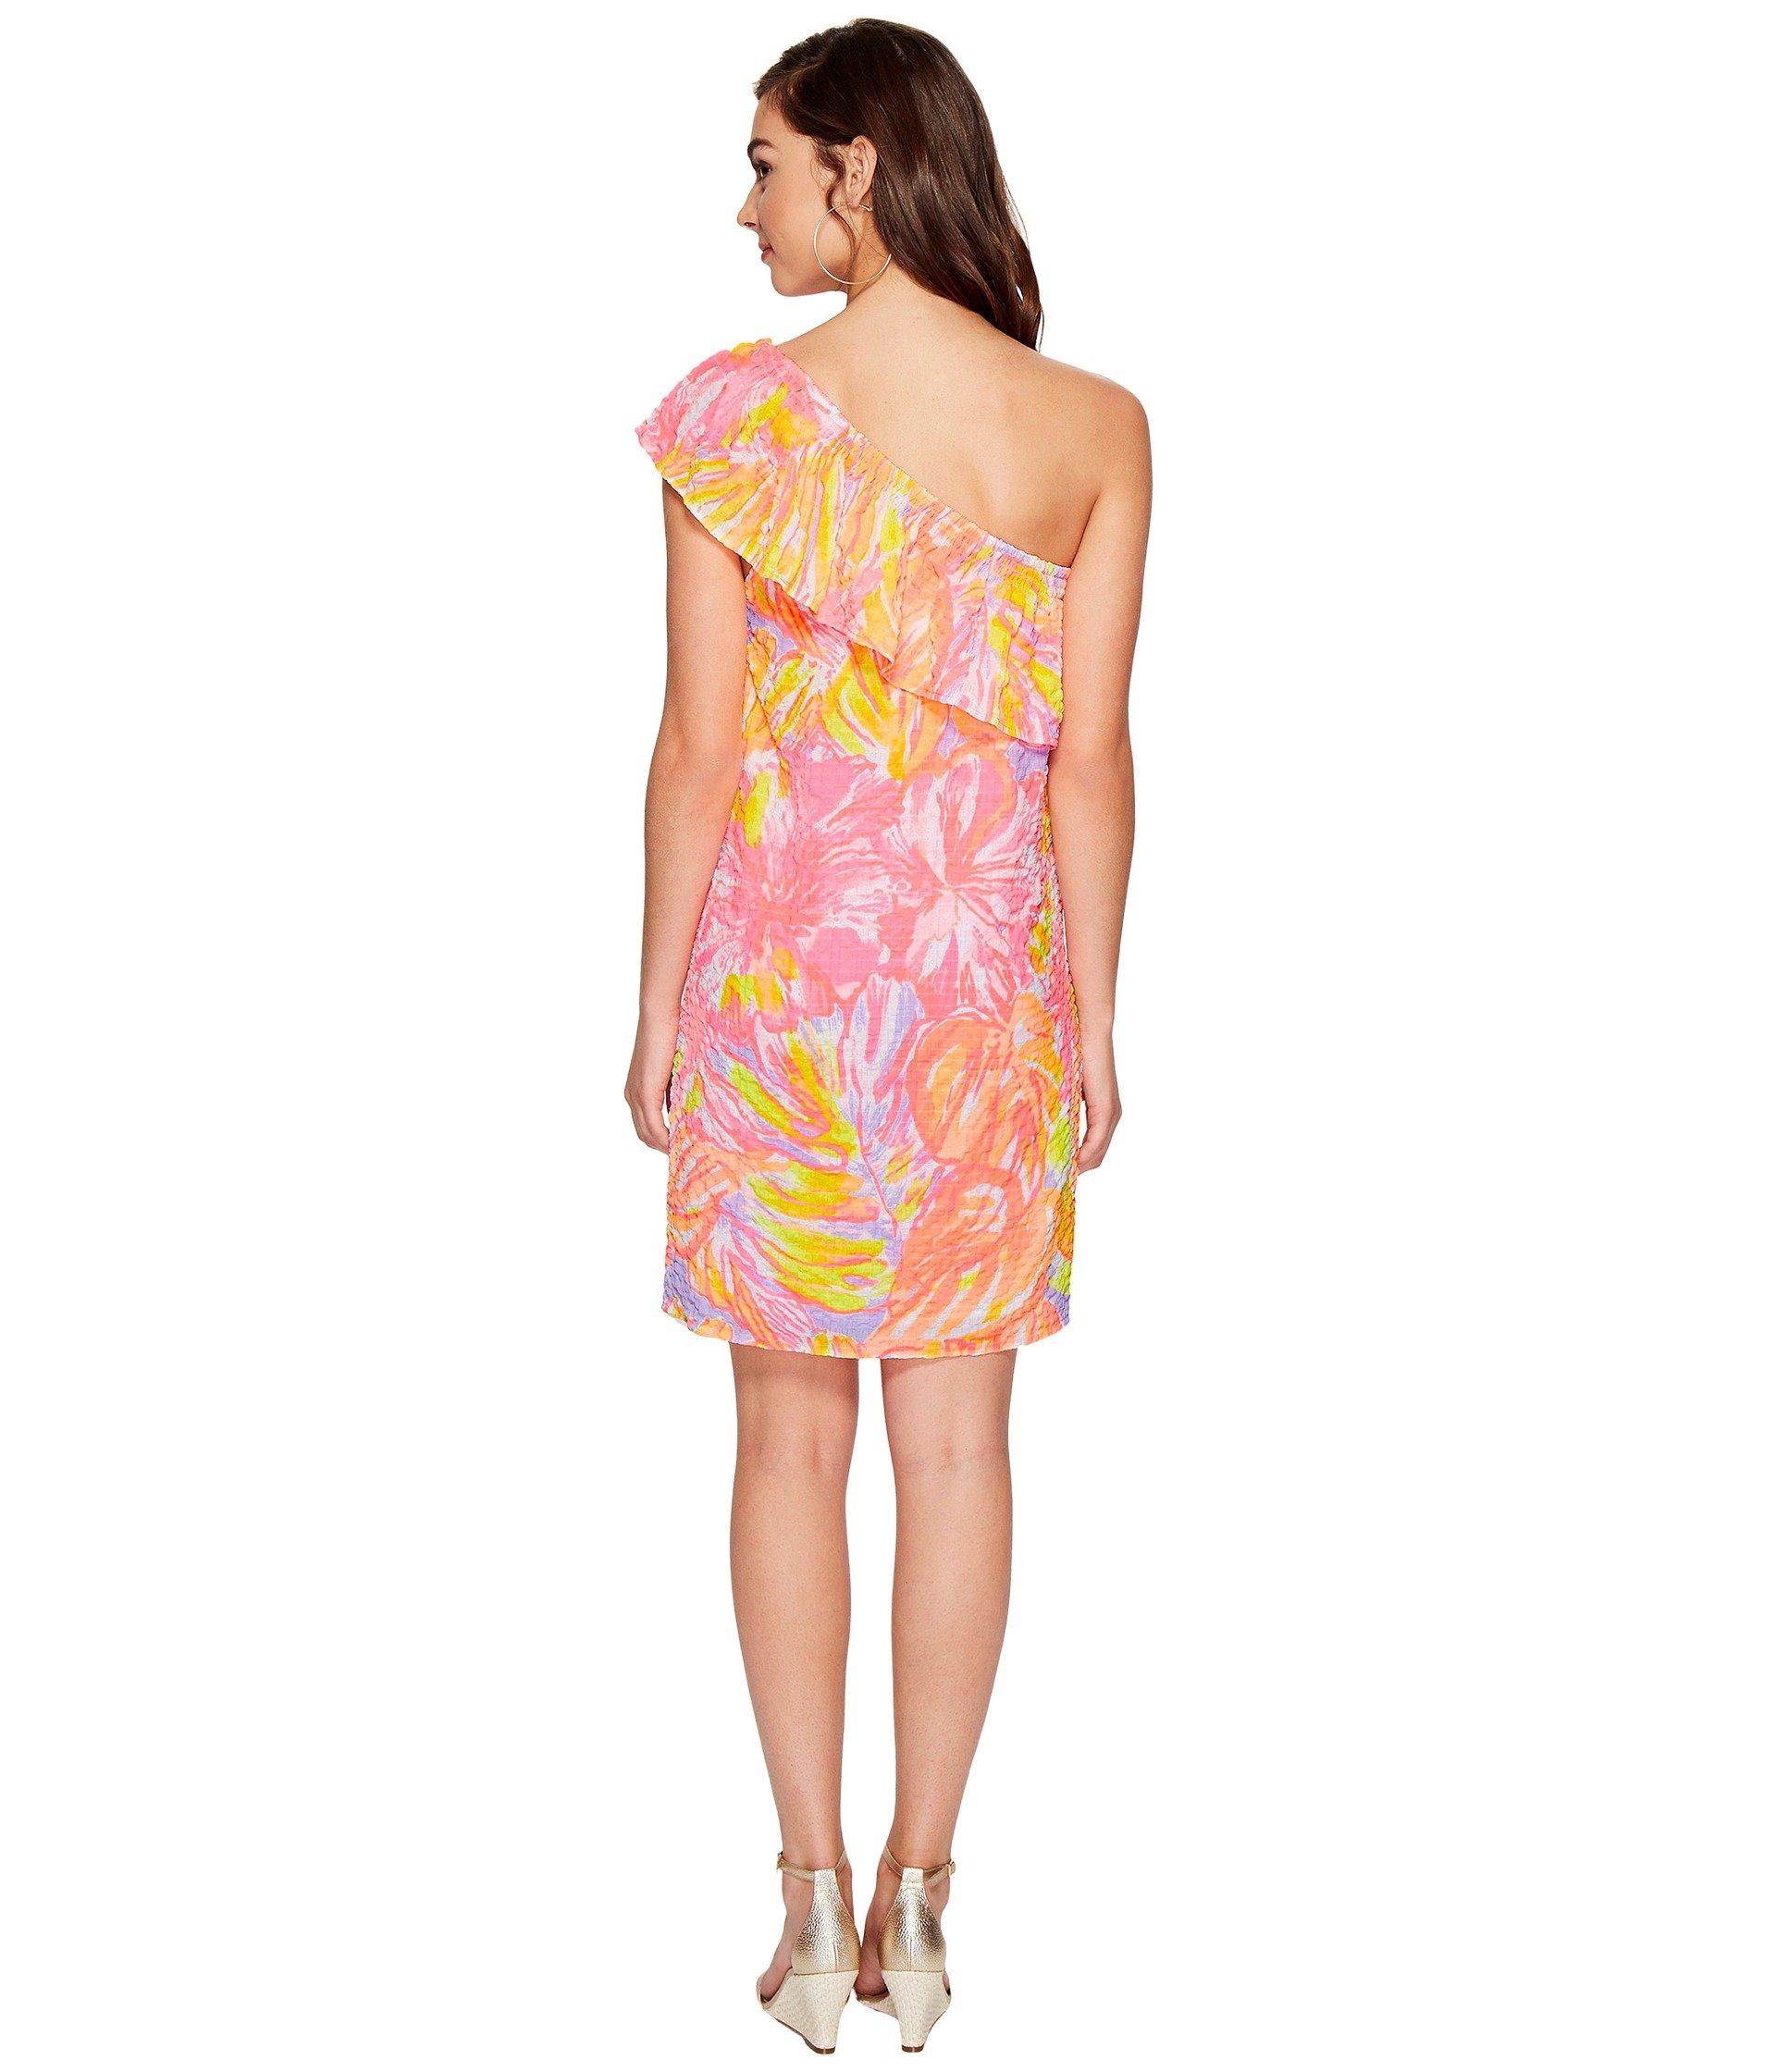 Splashed Lilly Sun Multi Dress Pulitzer Emmeline xCxqwfXvS